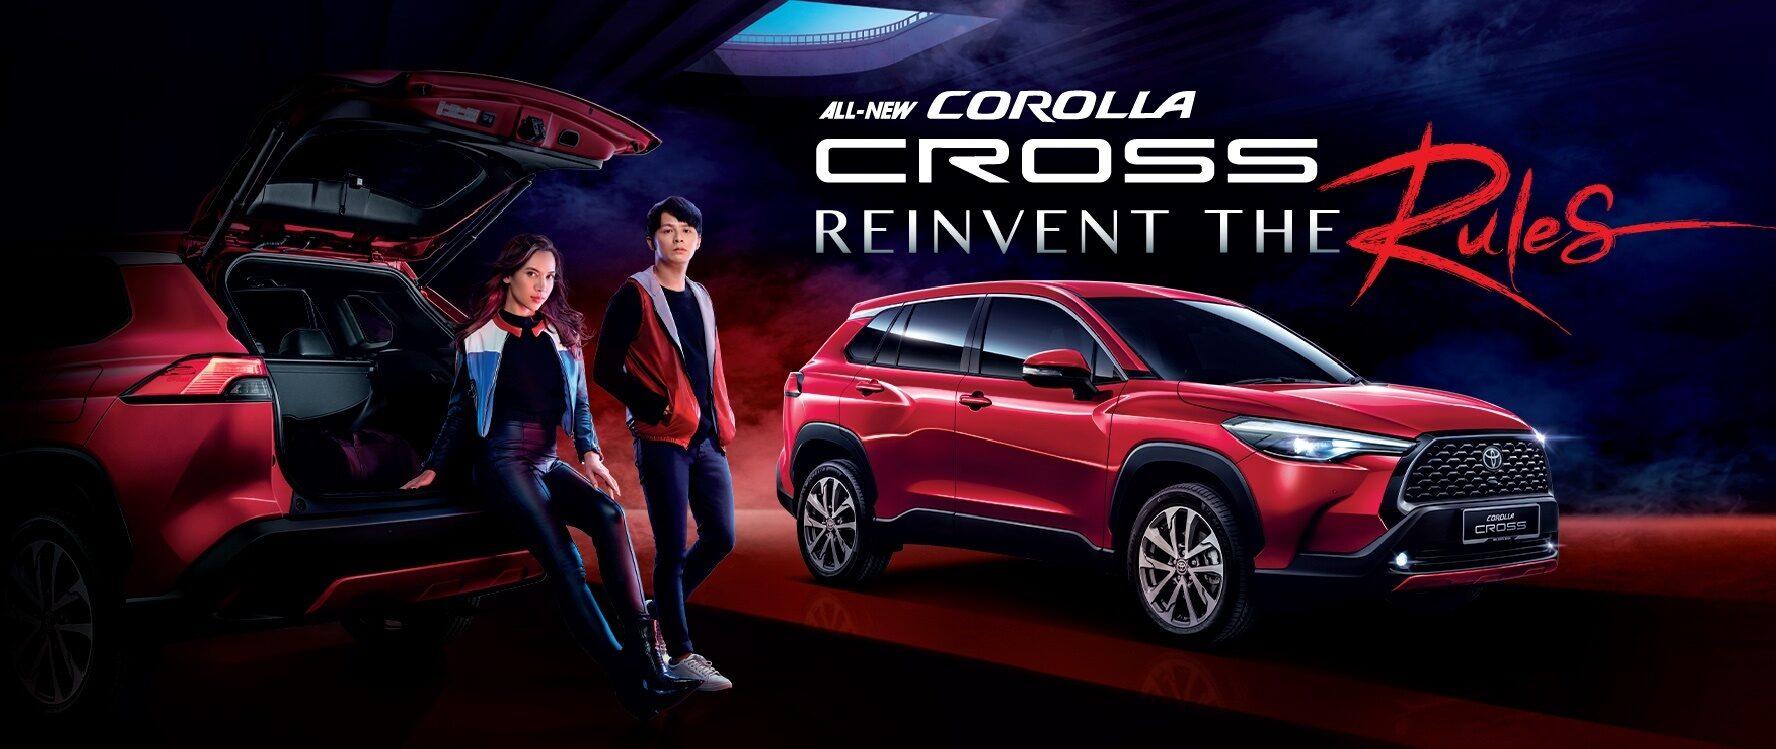 mainb desk Corolla Cross